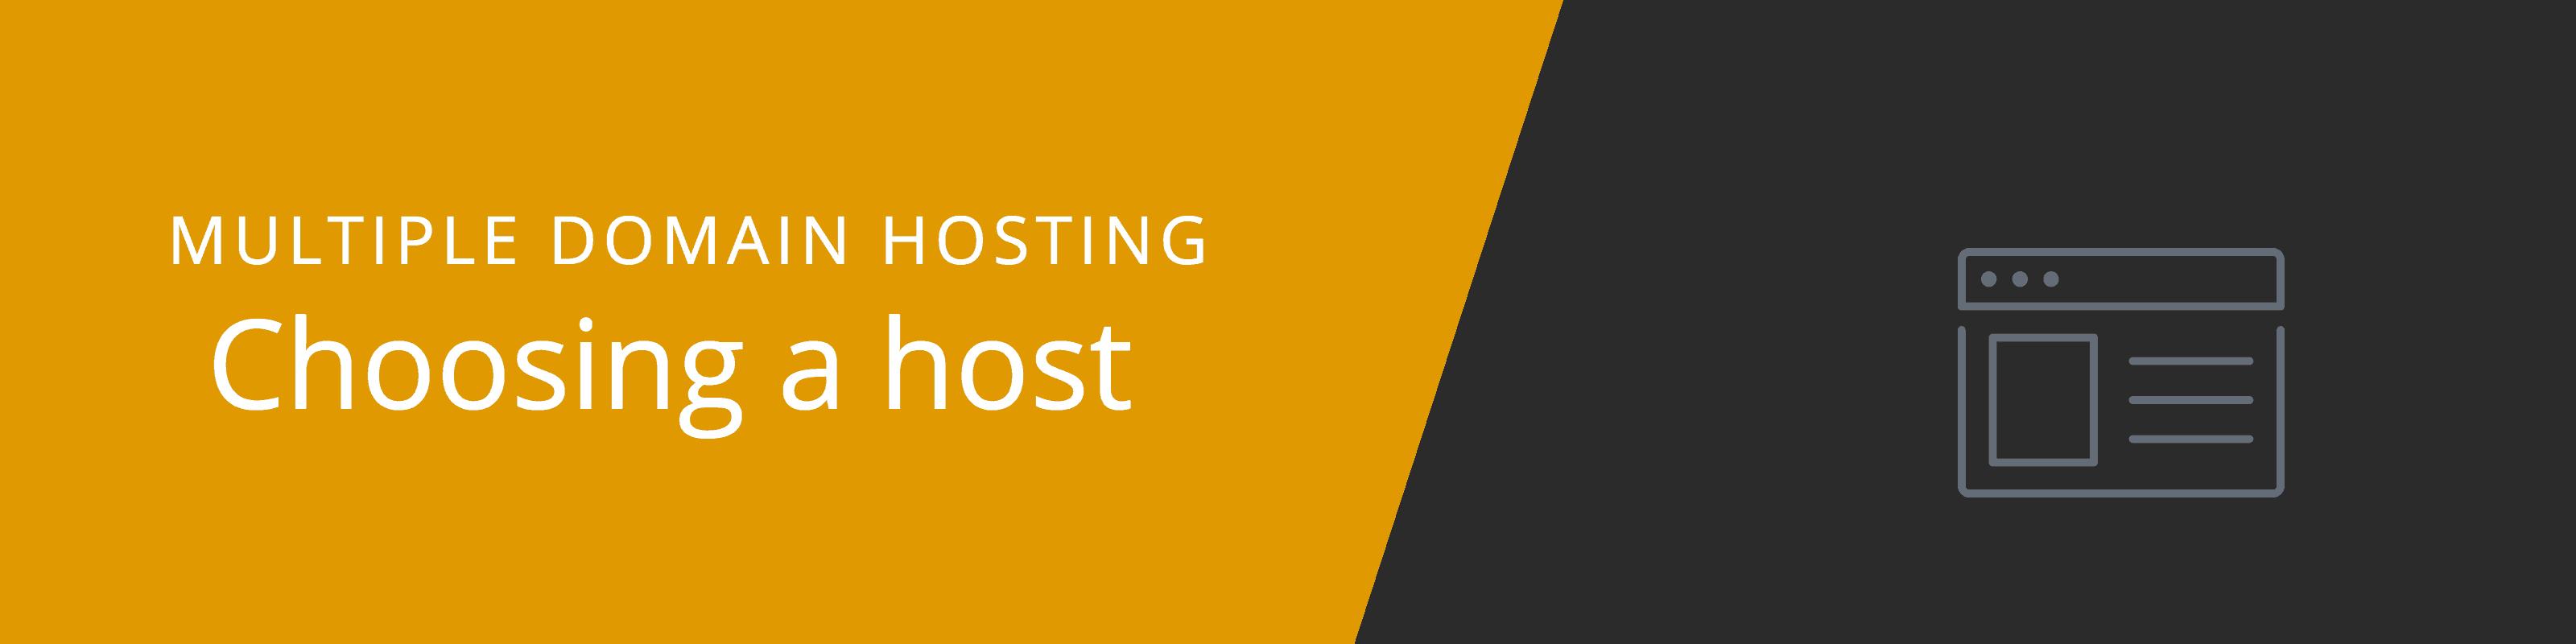 choosing host